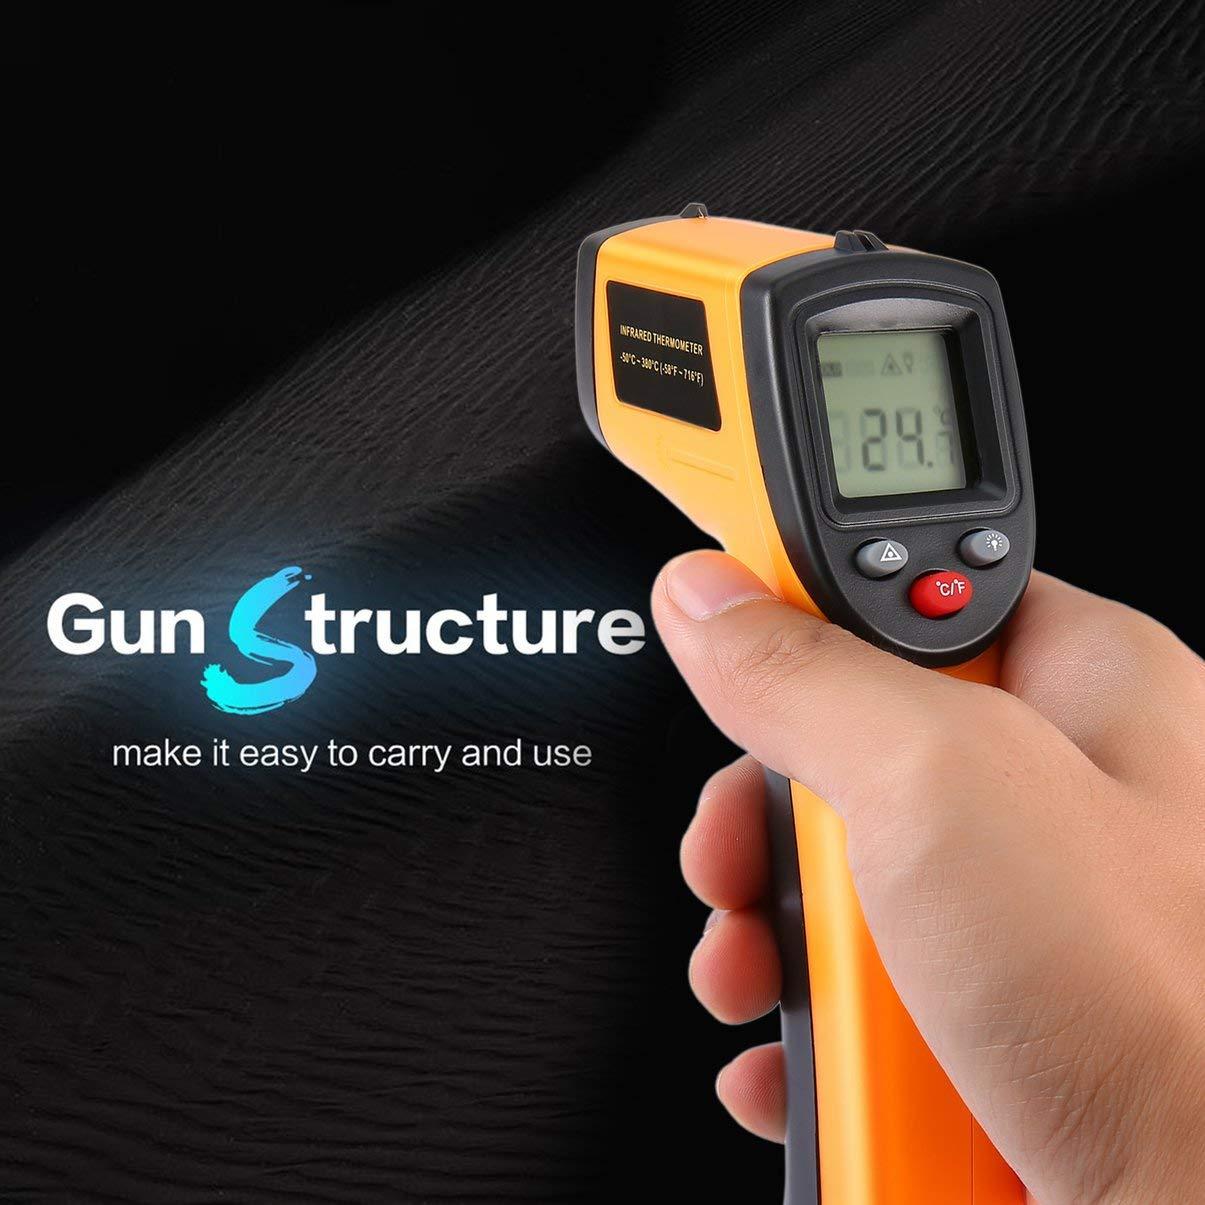 jaune Thermom/ètre infrarouge LCD LCD sans contact pistolet IR point thermique temp/érature dimagerie infrarouge m/ètre de poche pyrom/ètre